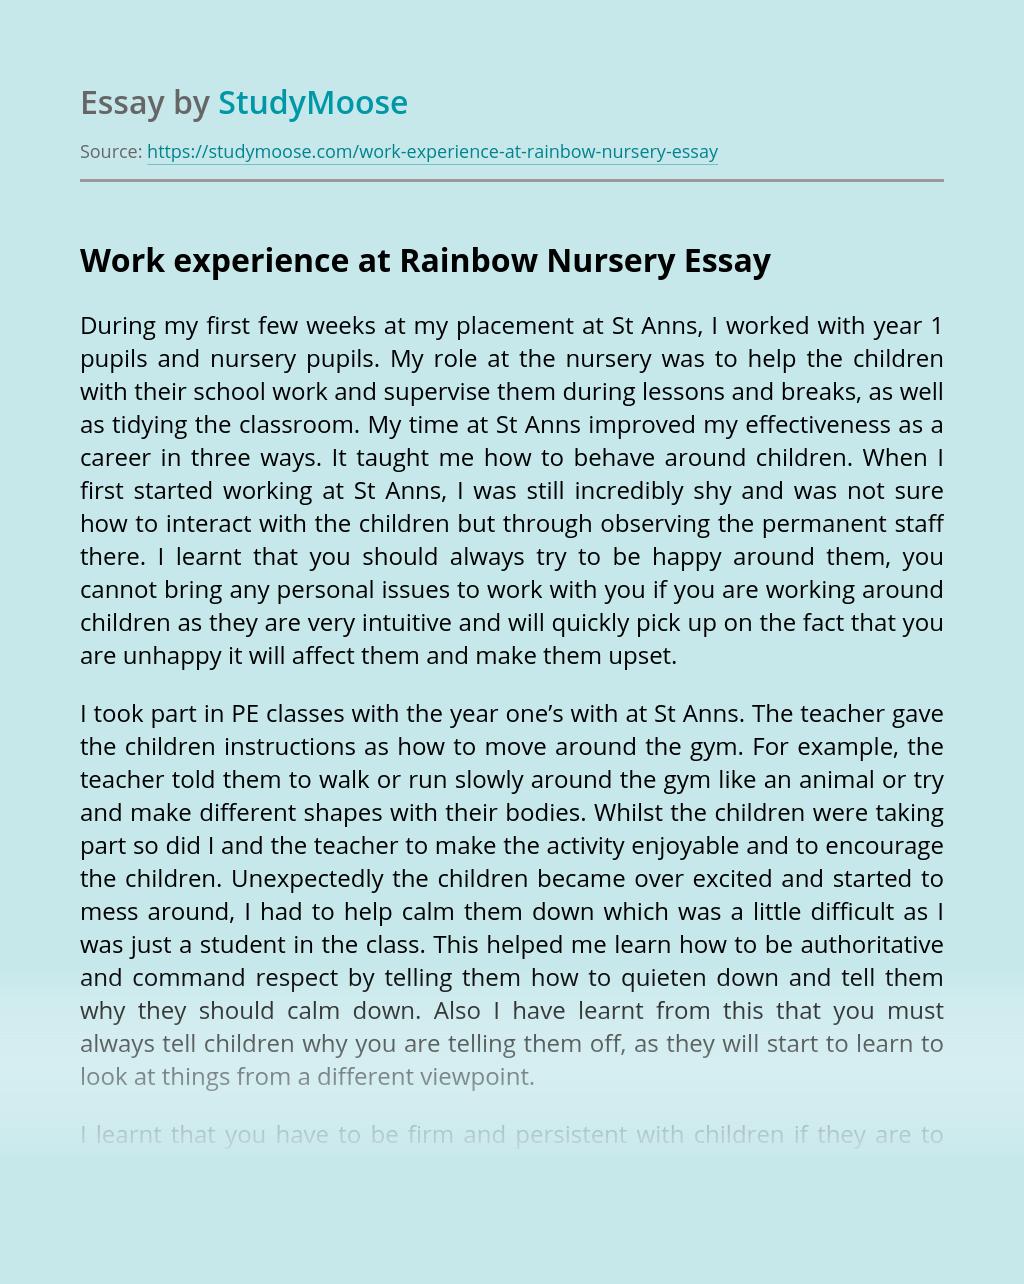 Work experience at Rainbow Nursery